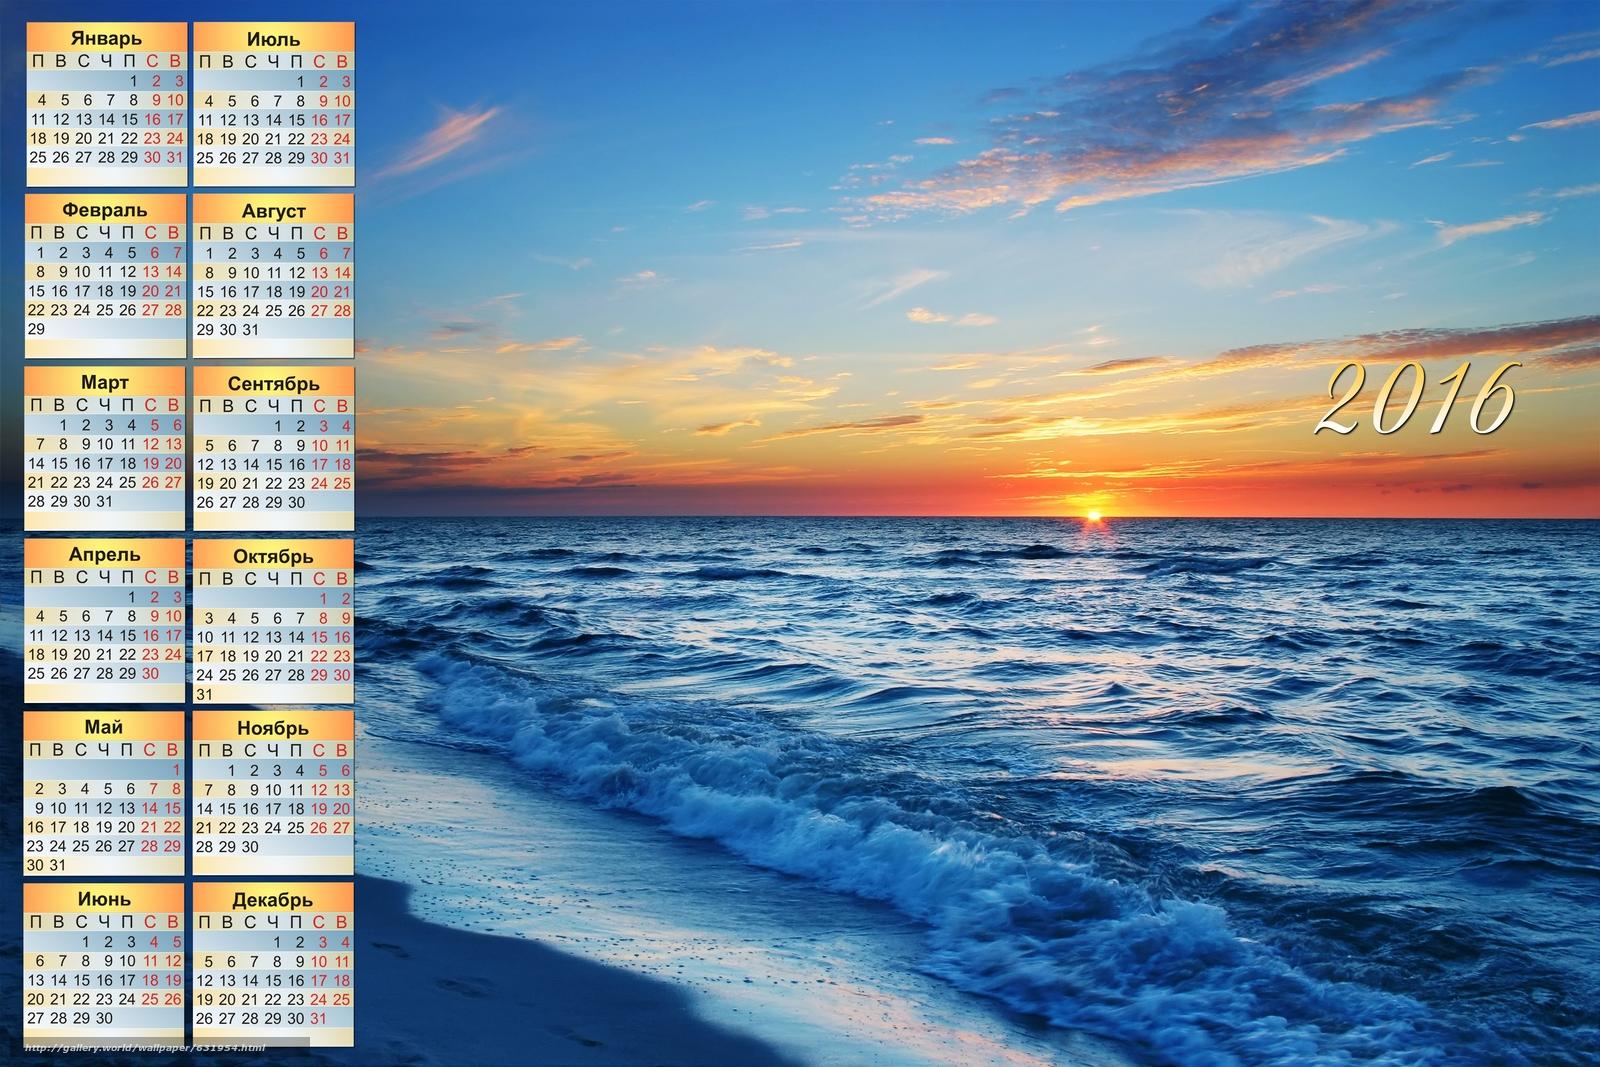 wallpaper Calendar for 2016 dawn in the ocean 2016 desktop 1600x1067